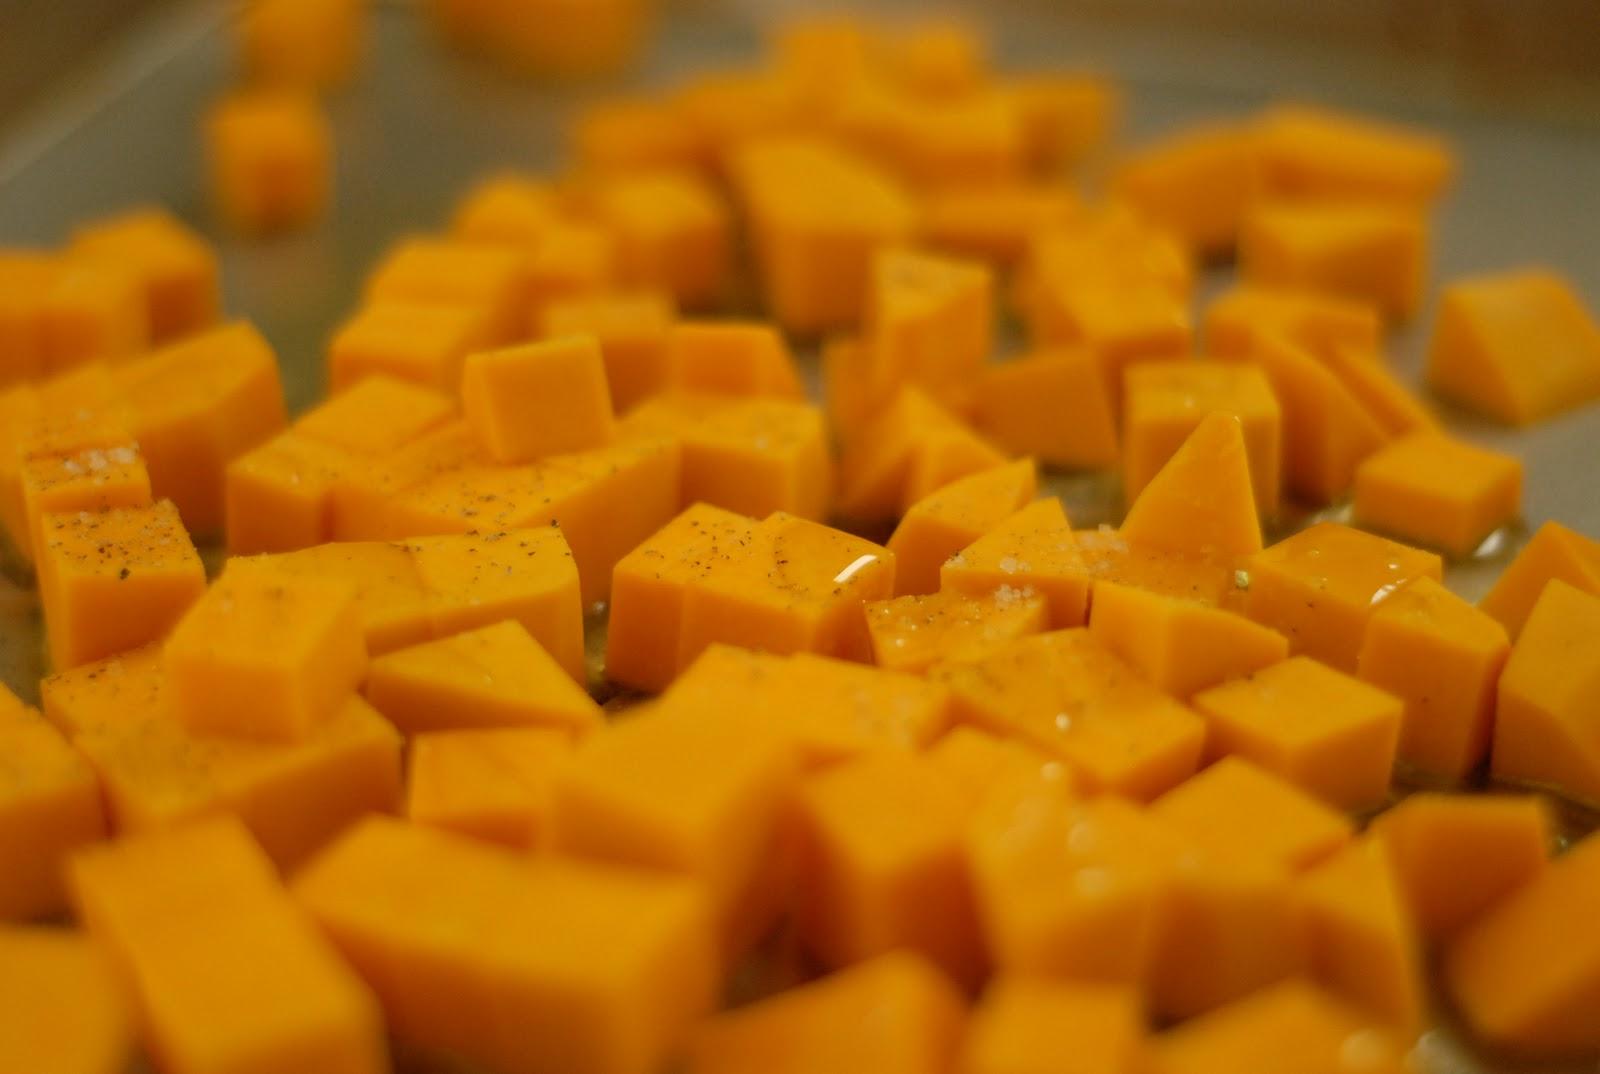 Foodie-bia: Broccoli Basil Mac and Cheese